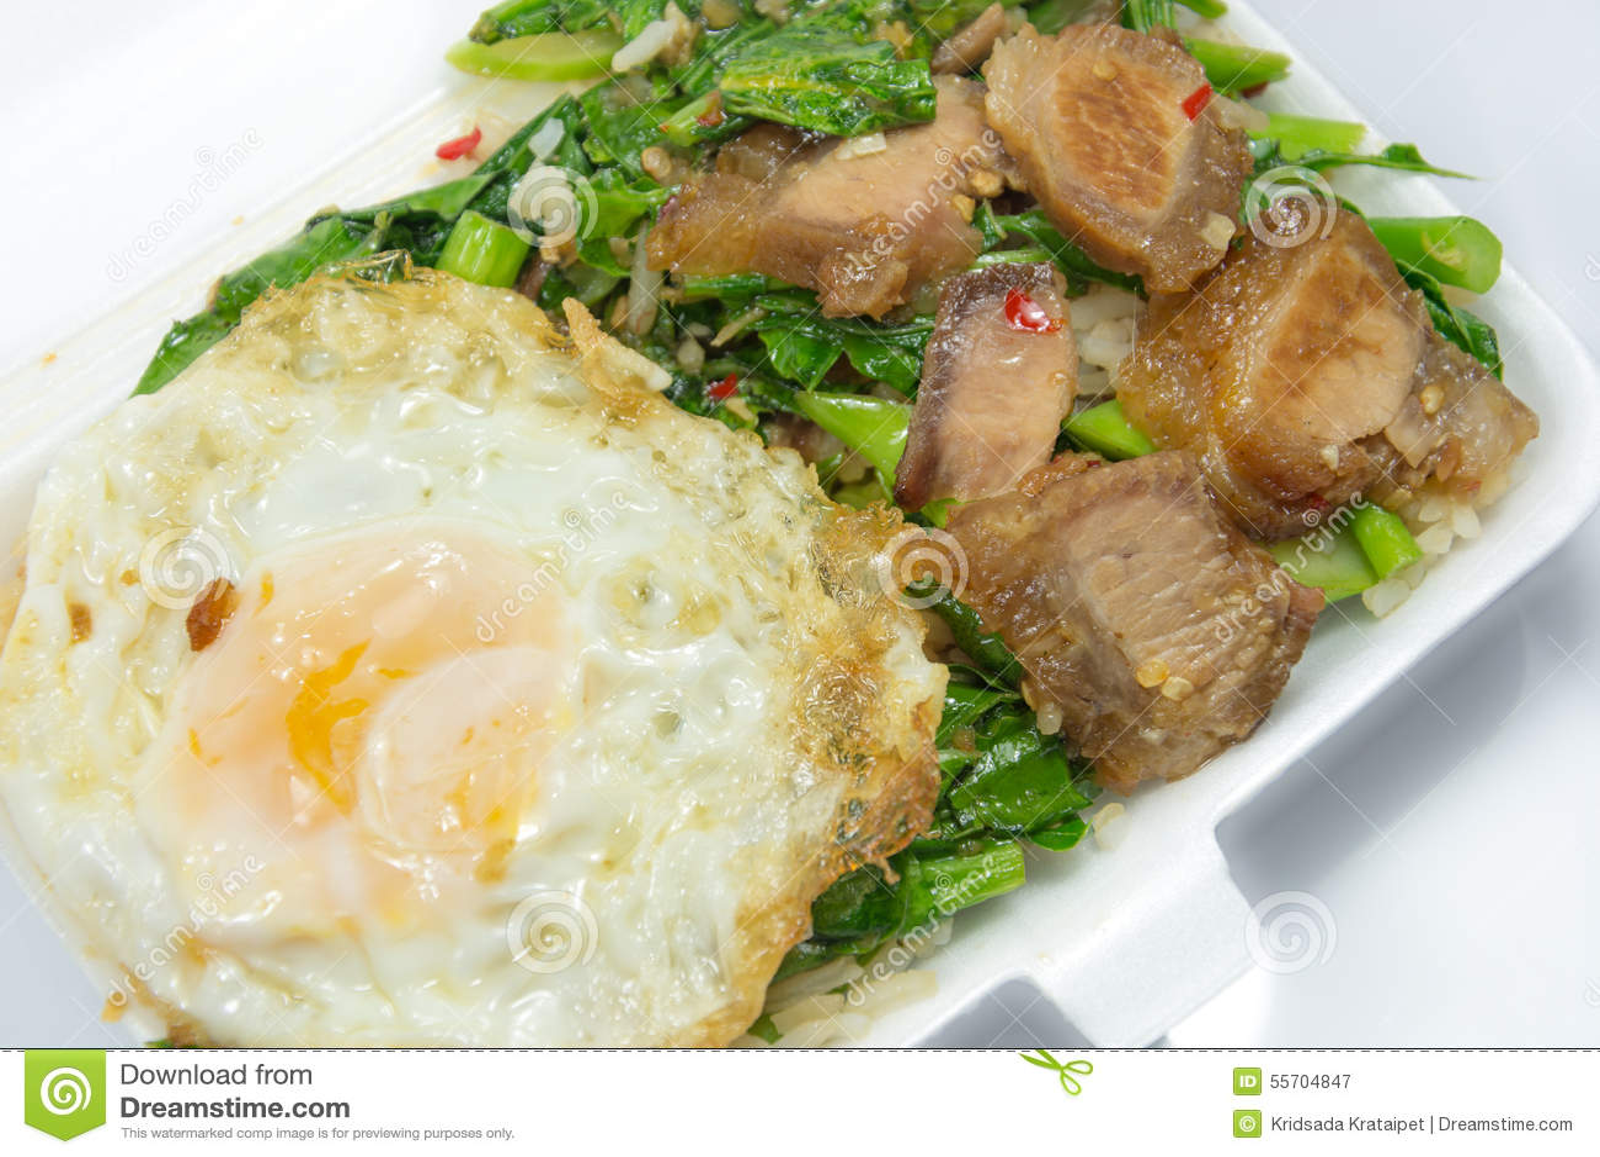 Thai Food - Stir Fry Crispy Pork With Kale (Kana Moo Grob) Stock